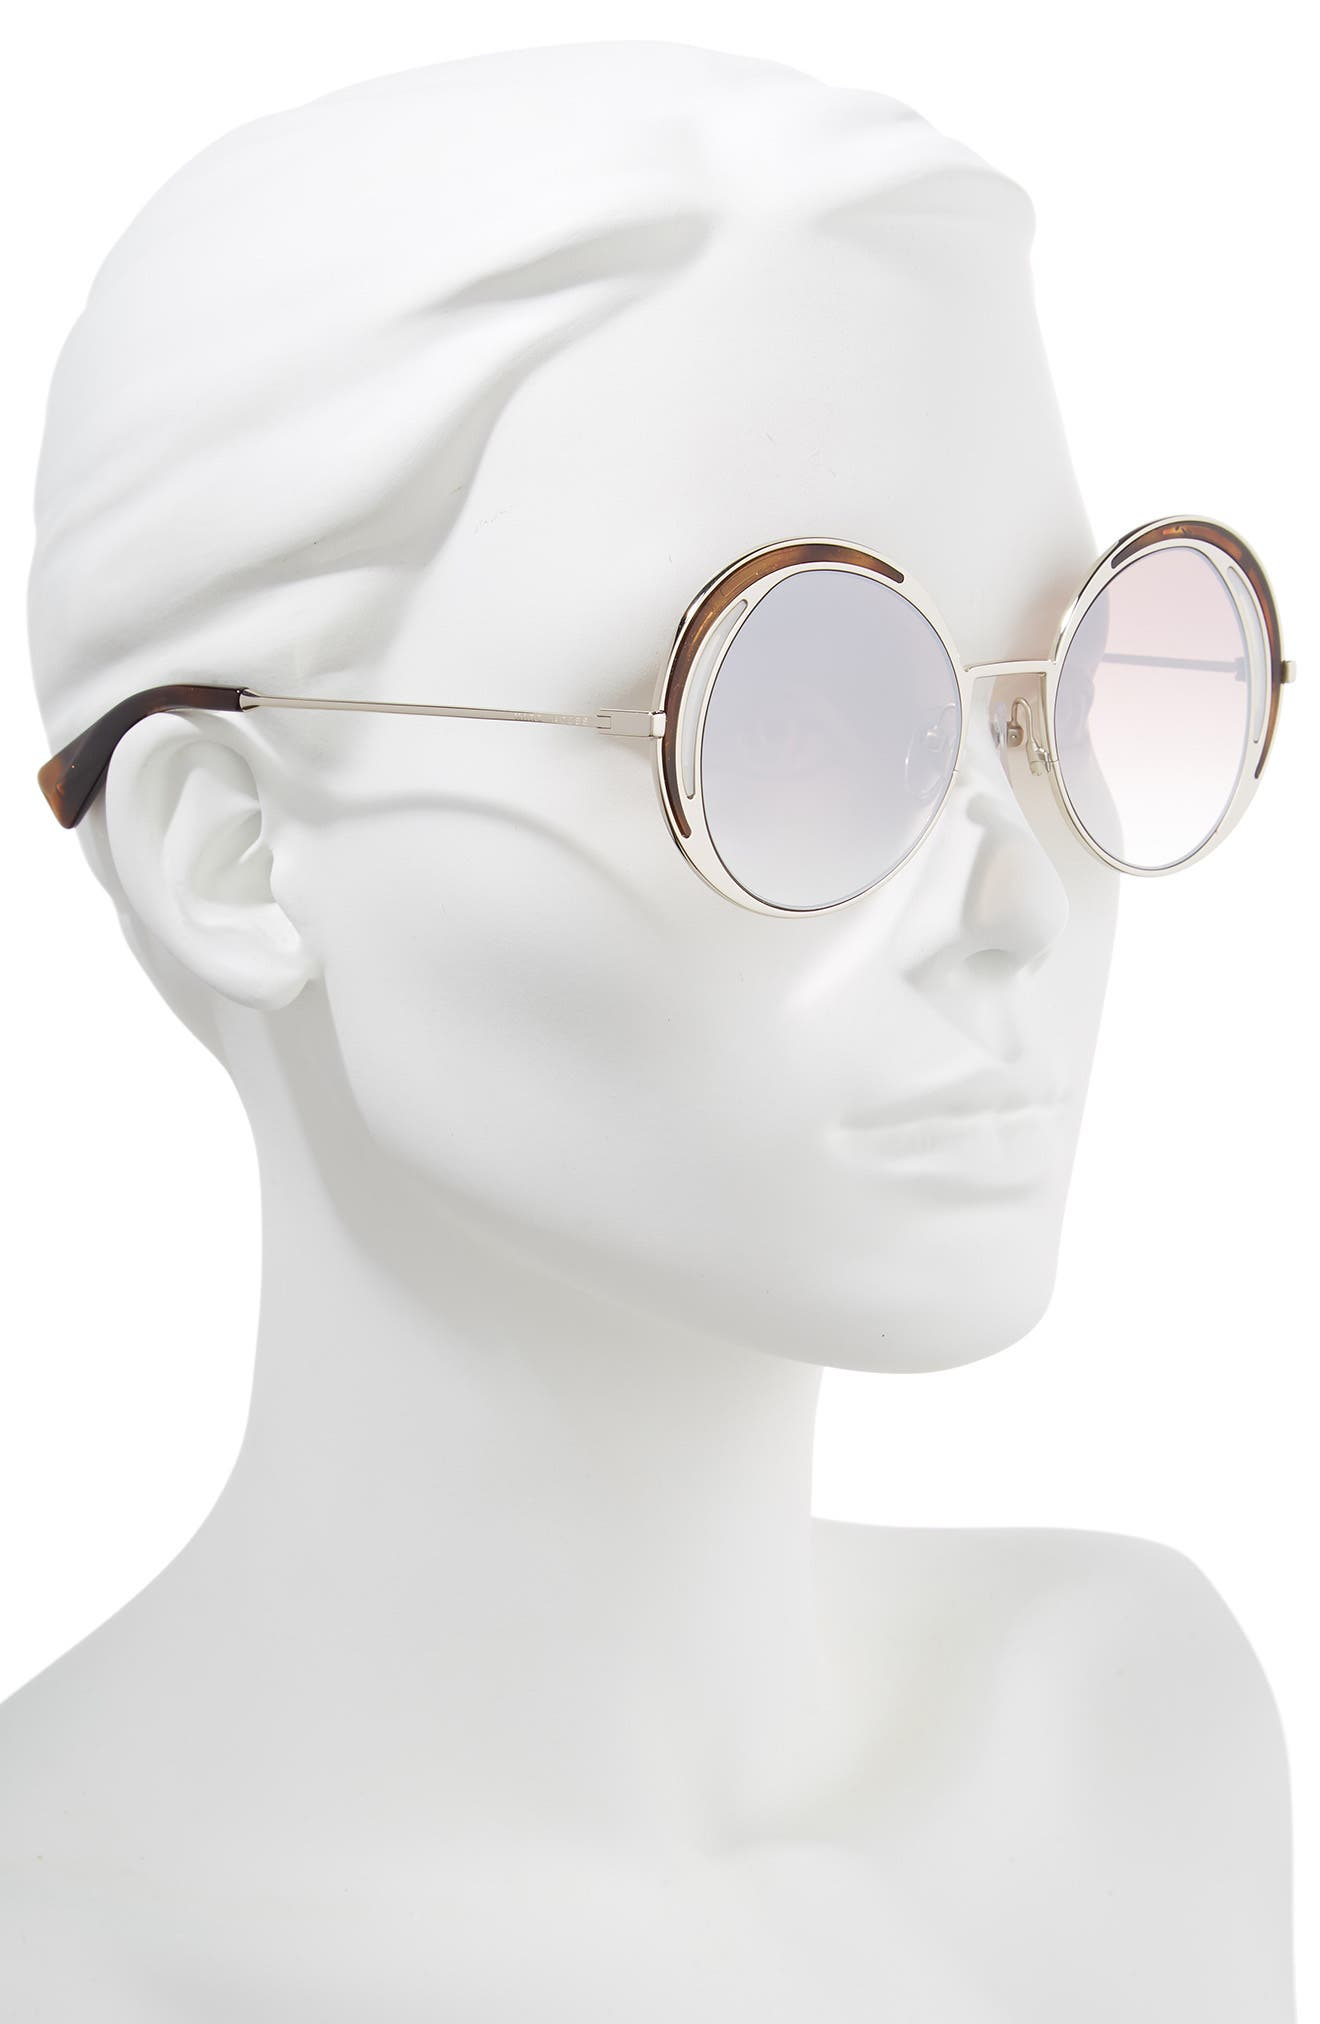 MARC JACOBS,                             51mm Round Sunglasses,                             Alternate thumbnail 2, color,                             DARK HAVANA/ GOLD